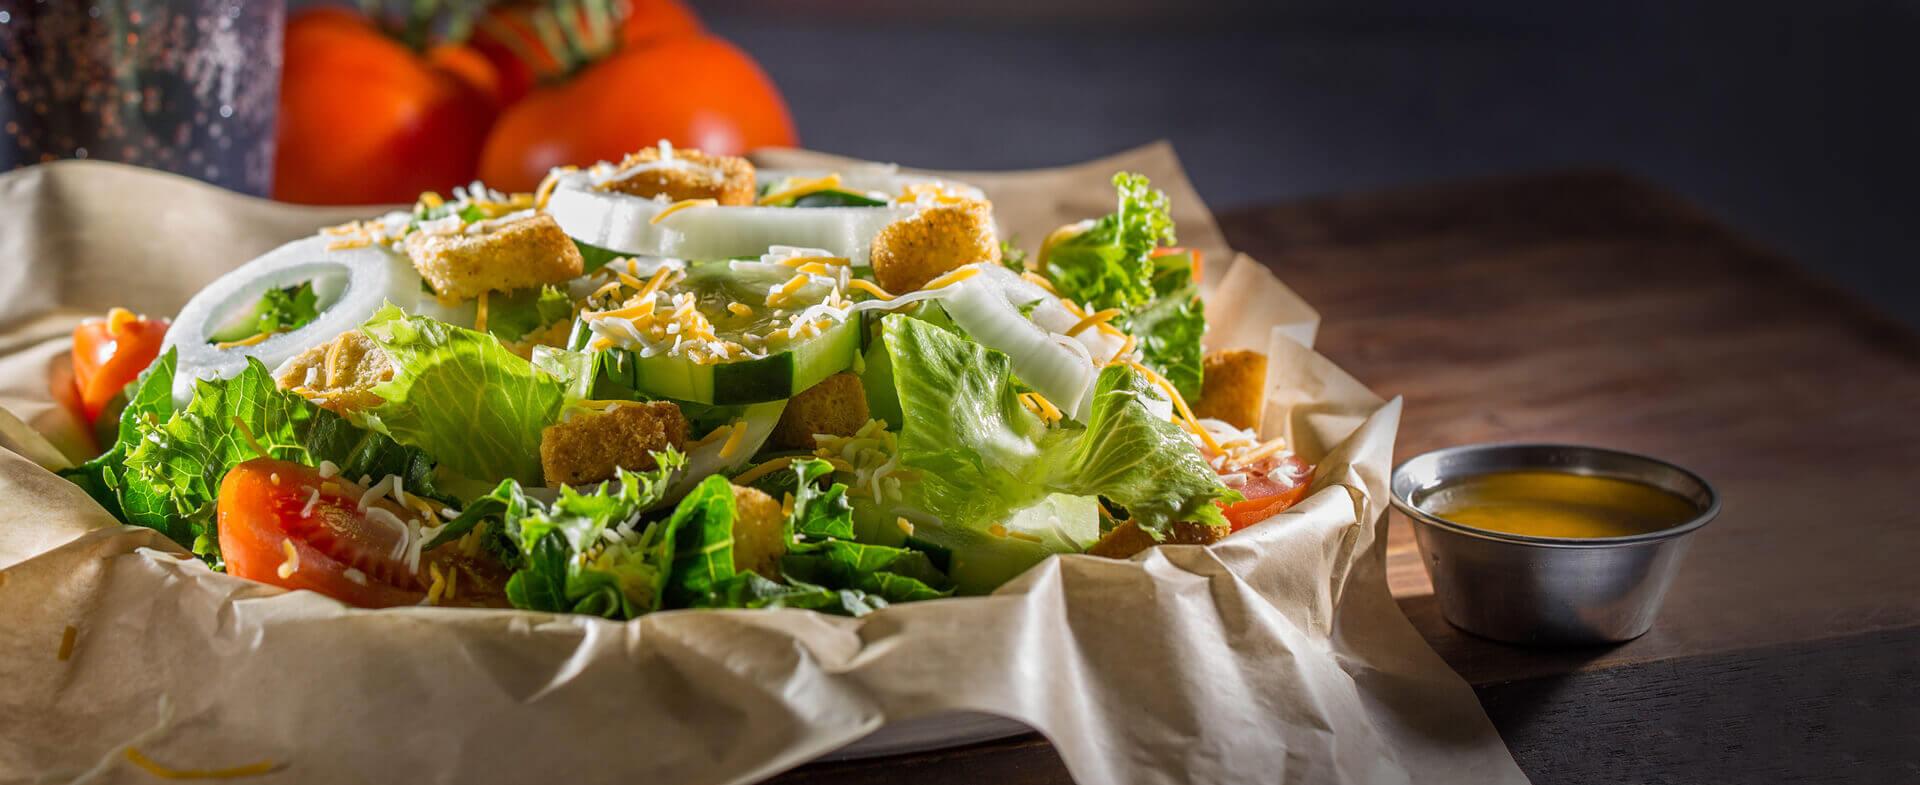 Garden Salad at Wayback Burgers